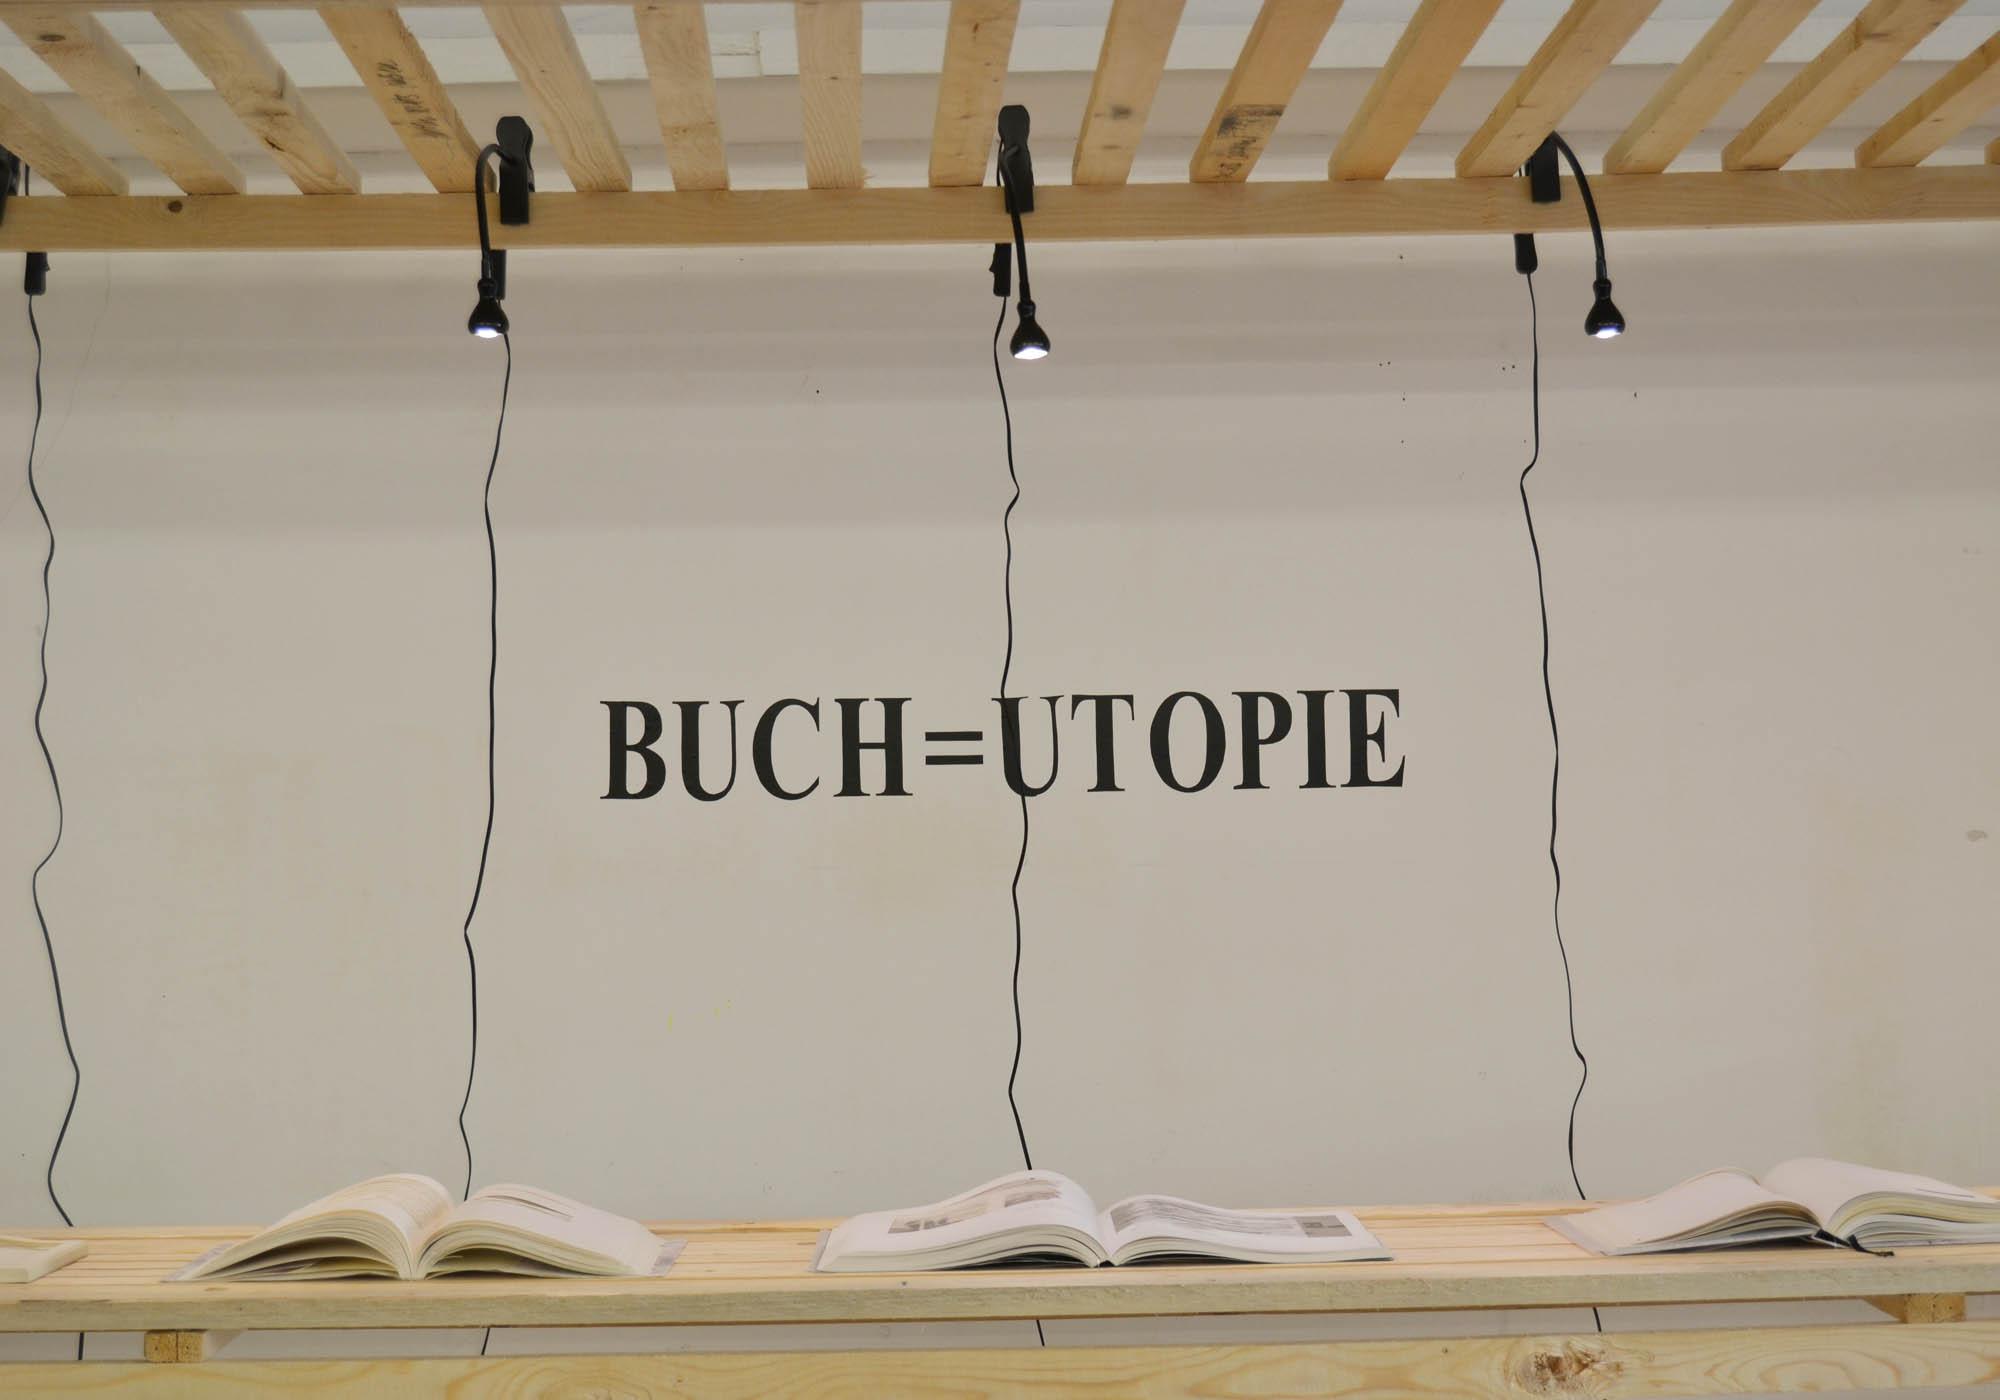 Ausstellungsansicht afip, Offenbach